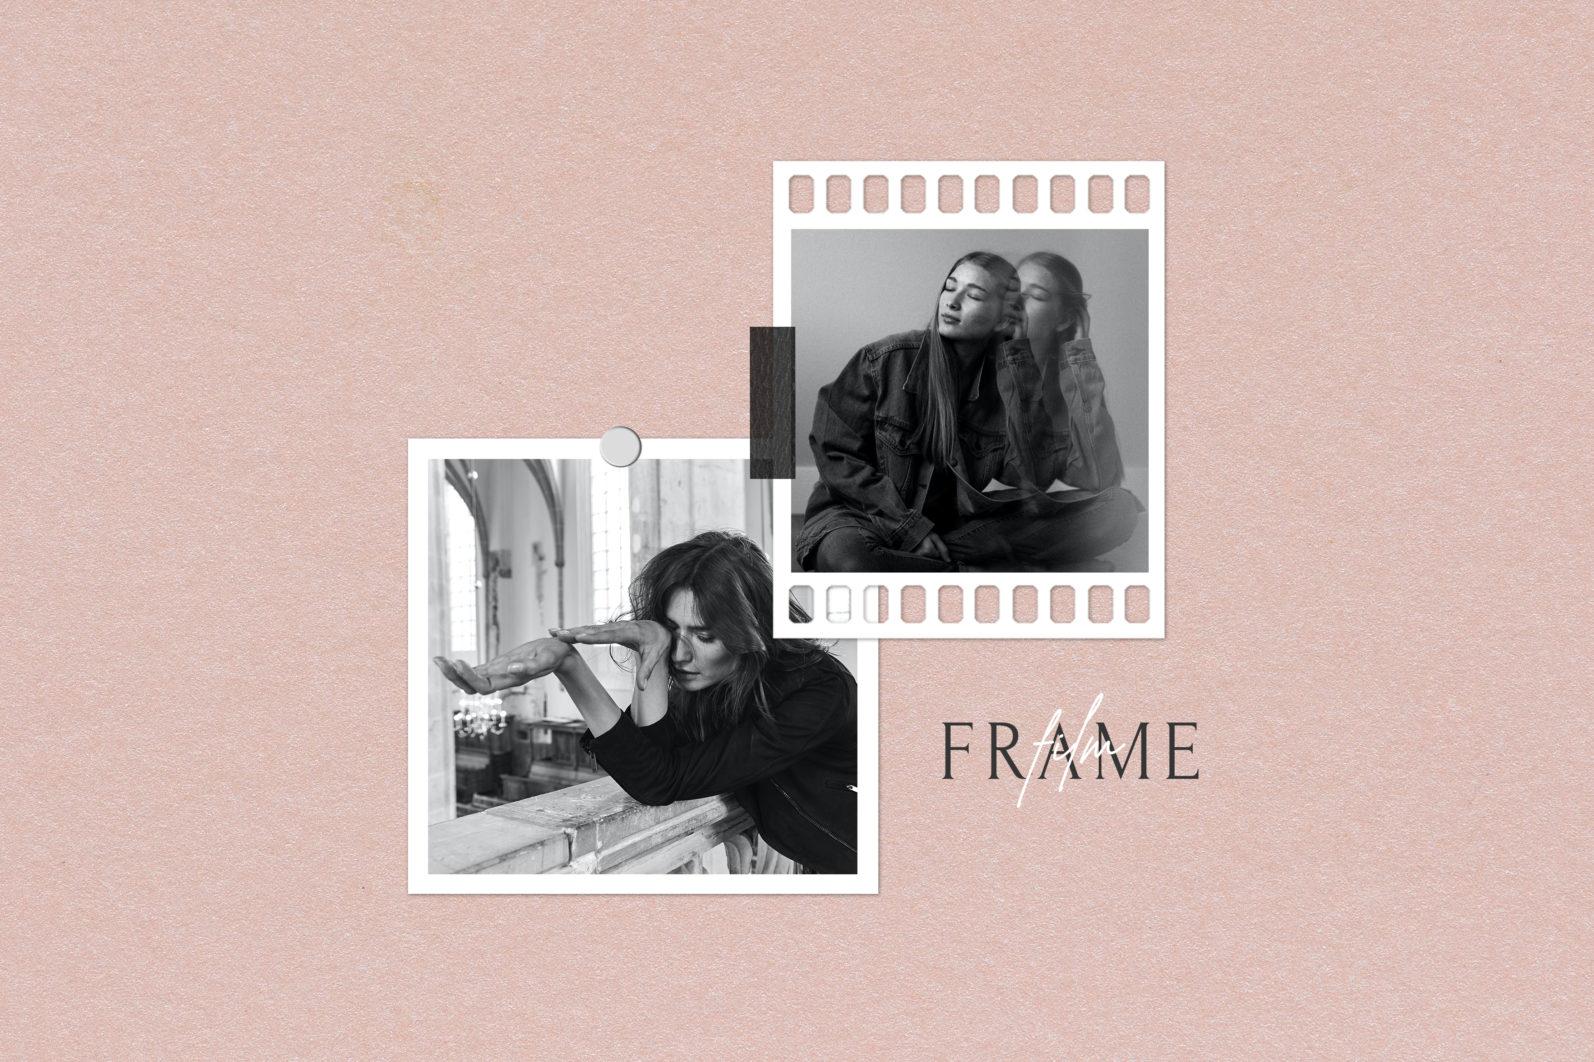 Frame Mockup #1416, White Portrait Photo Frame Mockup, Film Frame Mockup - 1416 Preview 1 scaled -